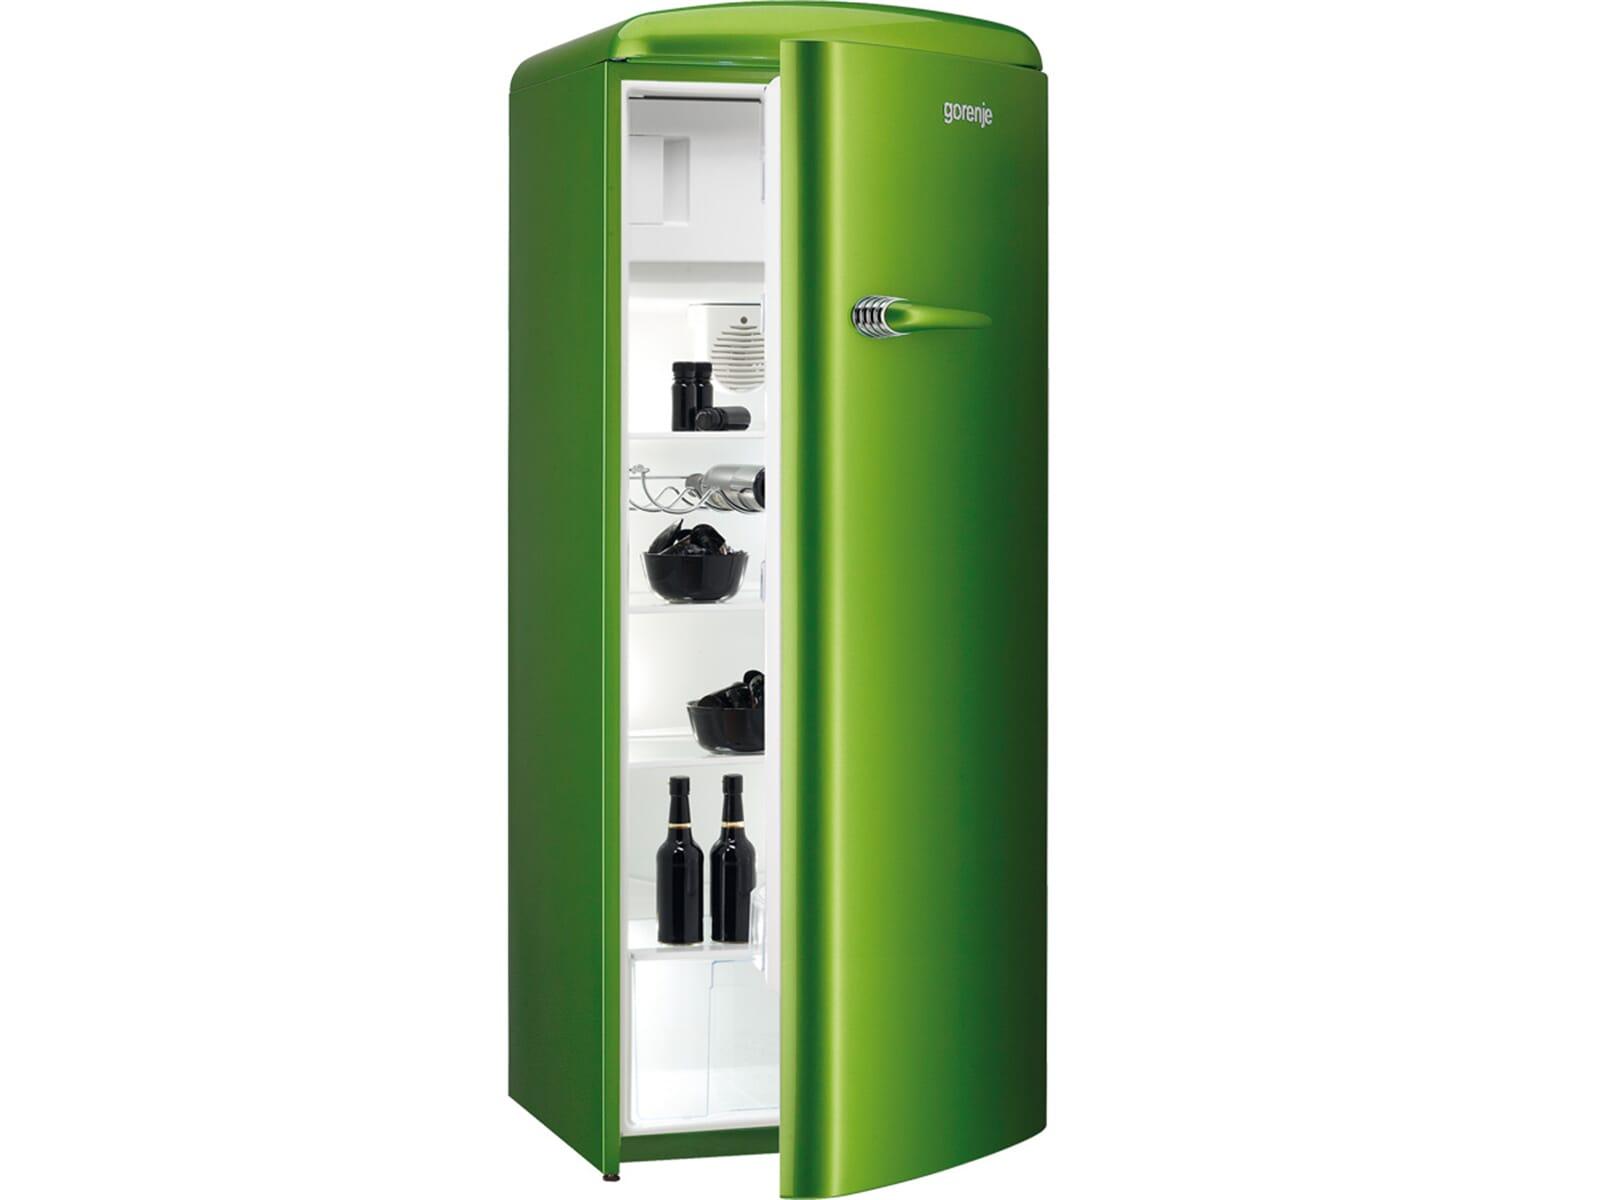 Smeg Grun Retro Kühlschrank - Dion Debra Blog